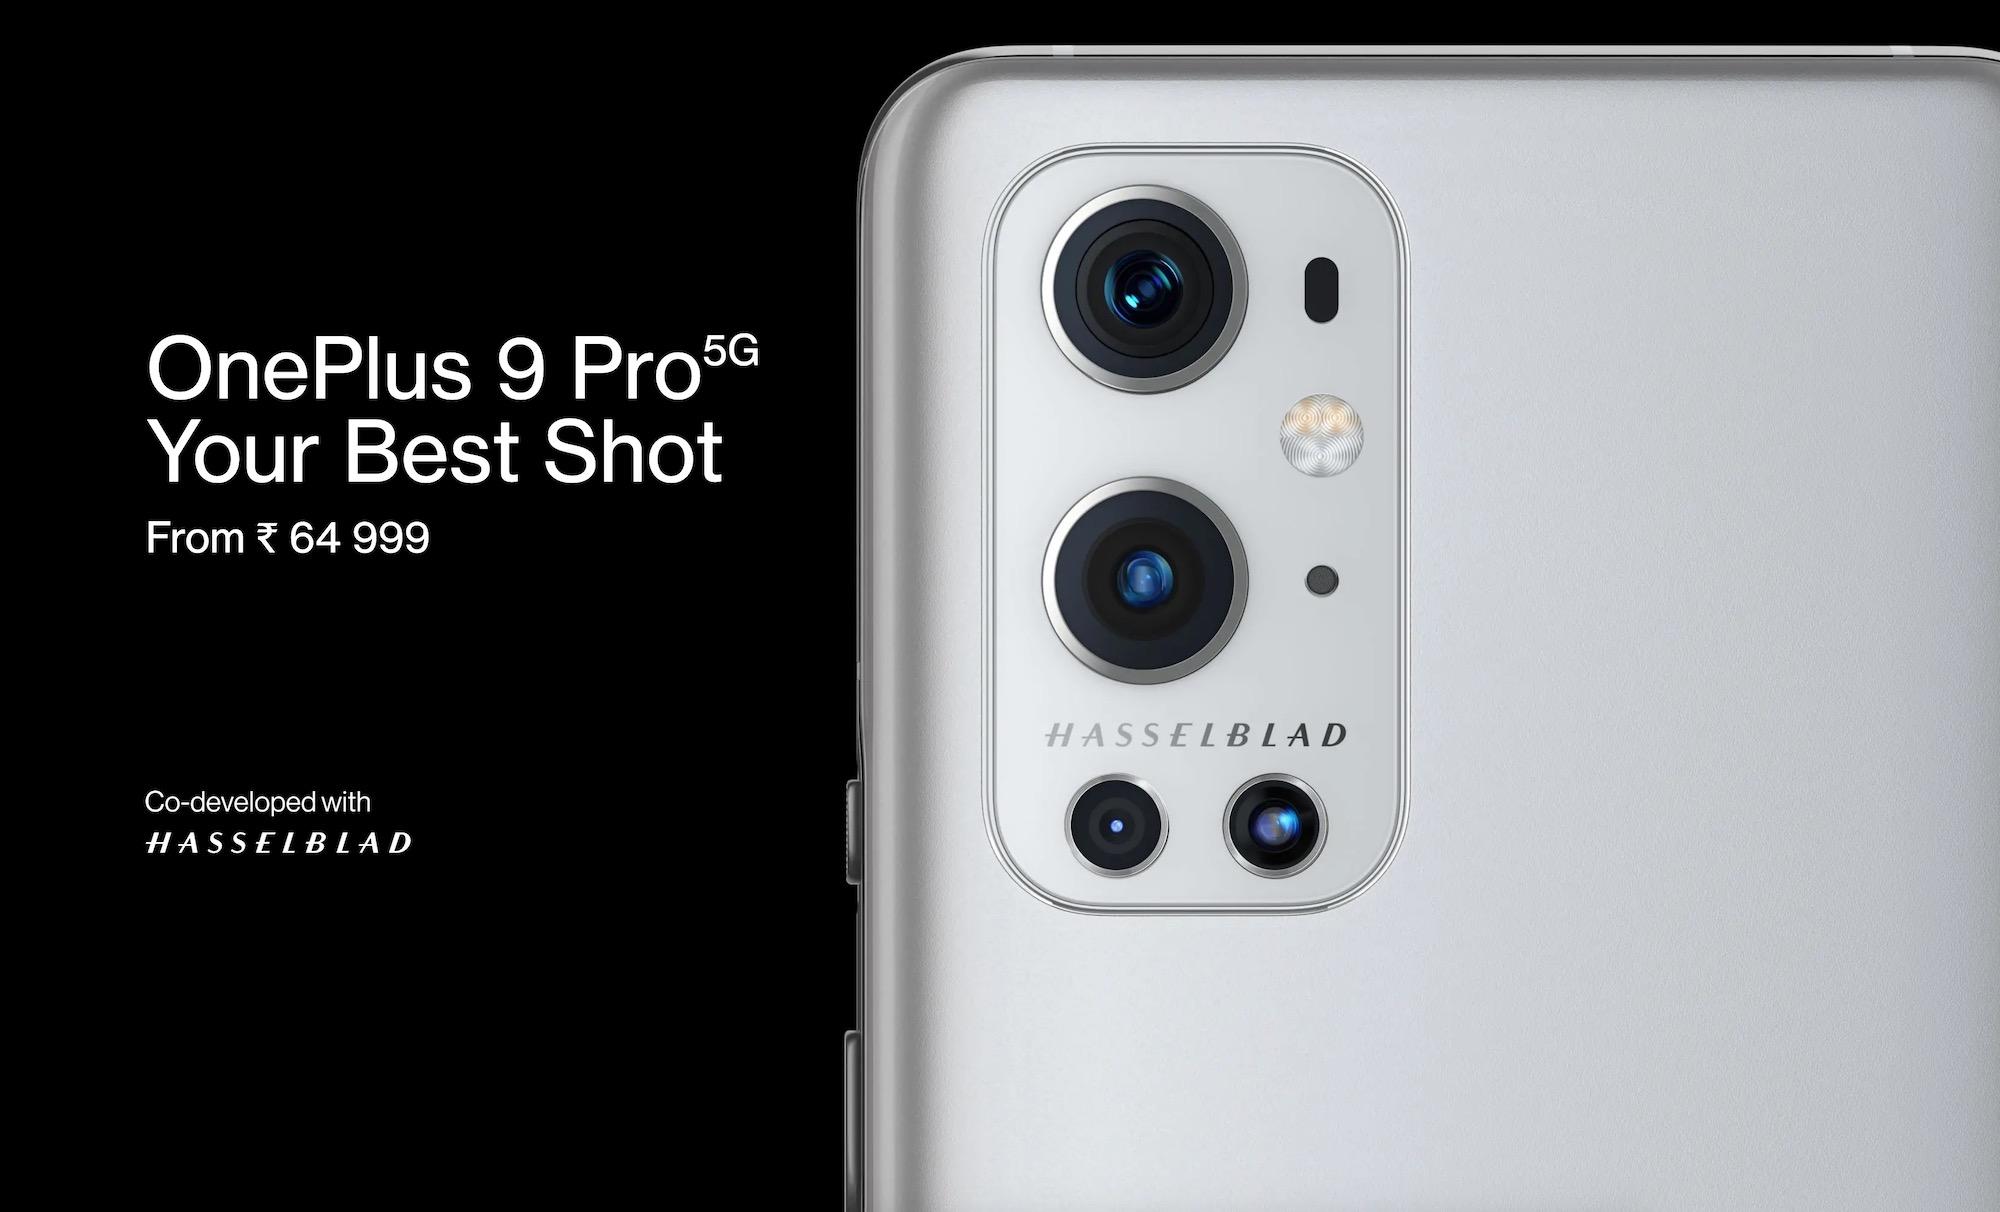 oneplus 9 pro 5g smartphone